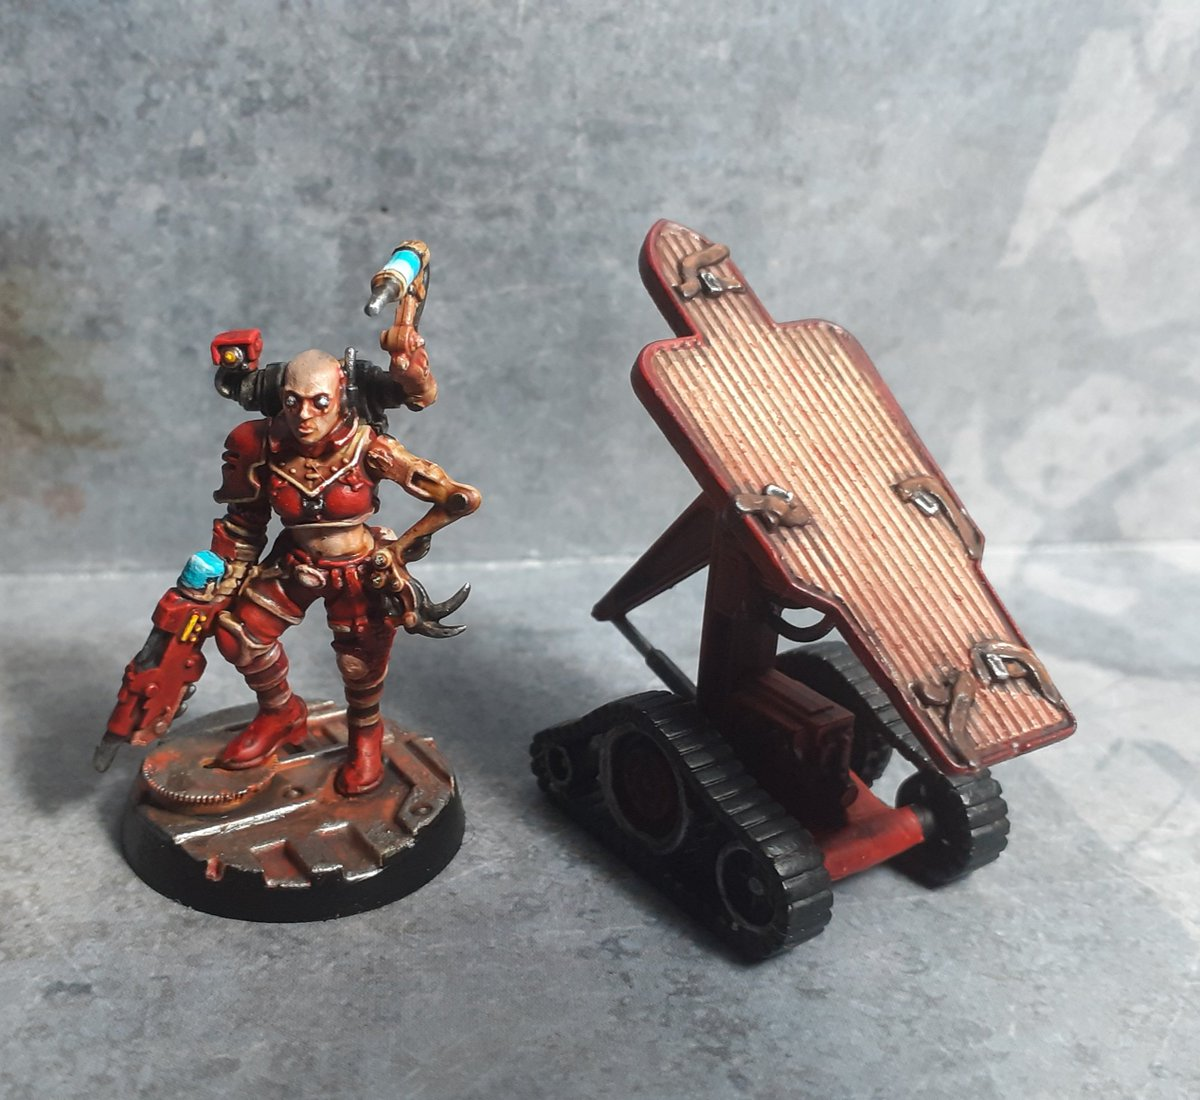 #necromunda rogue doc for my #escher gang. #warhammer40k #kitbash #WarhammerCommunity https://t.co/4CPBFGDRSs